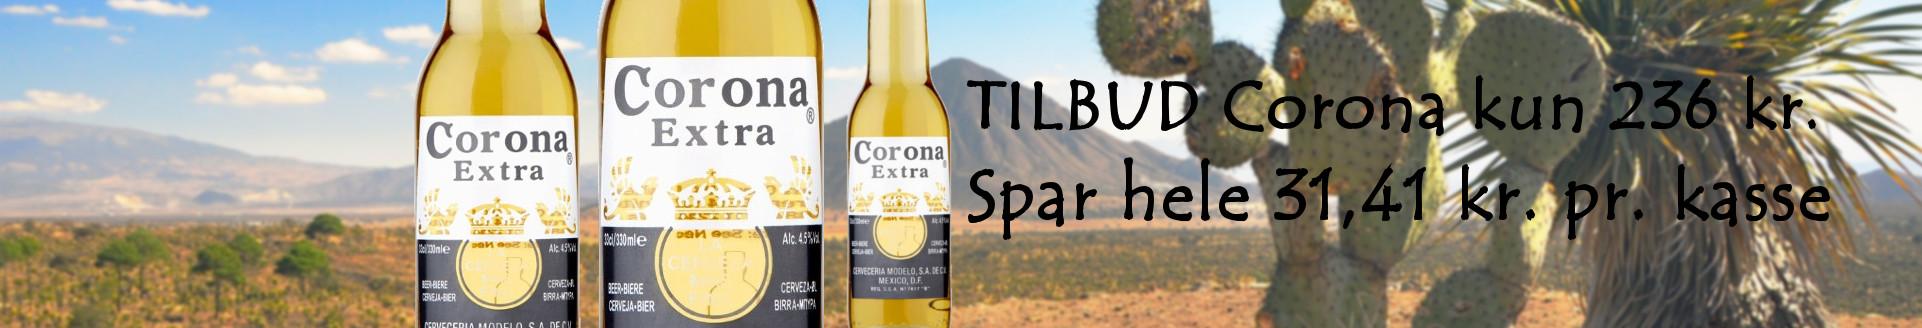 Corona_Extra_tilbud_2019_v5